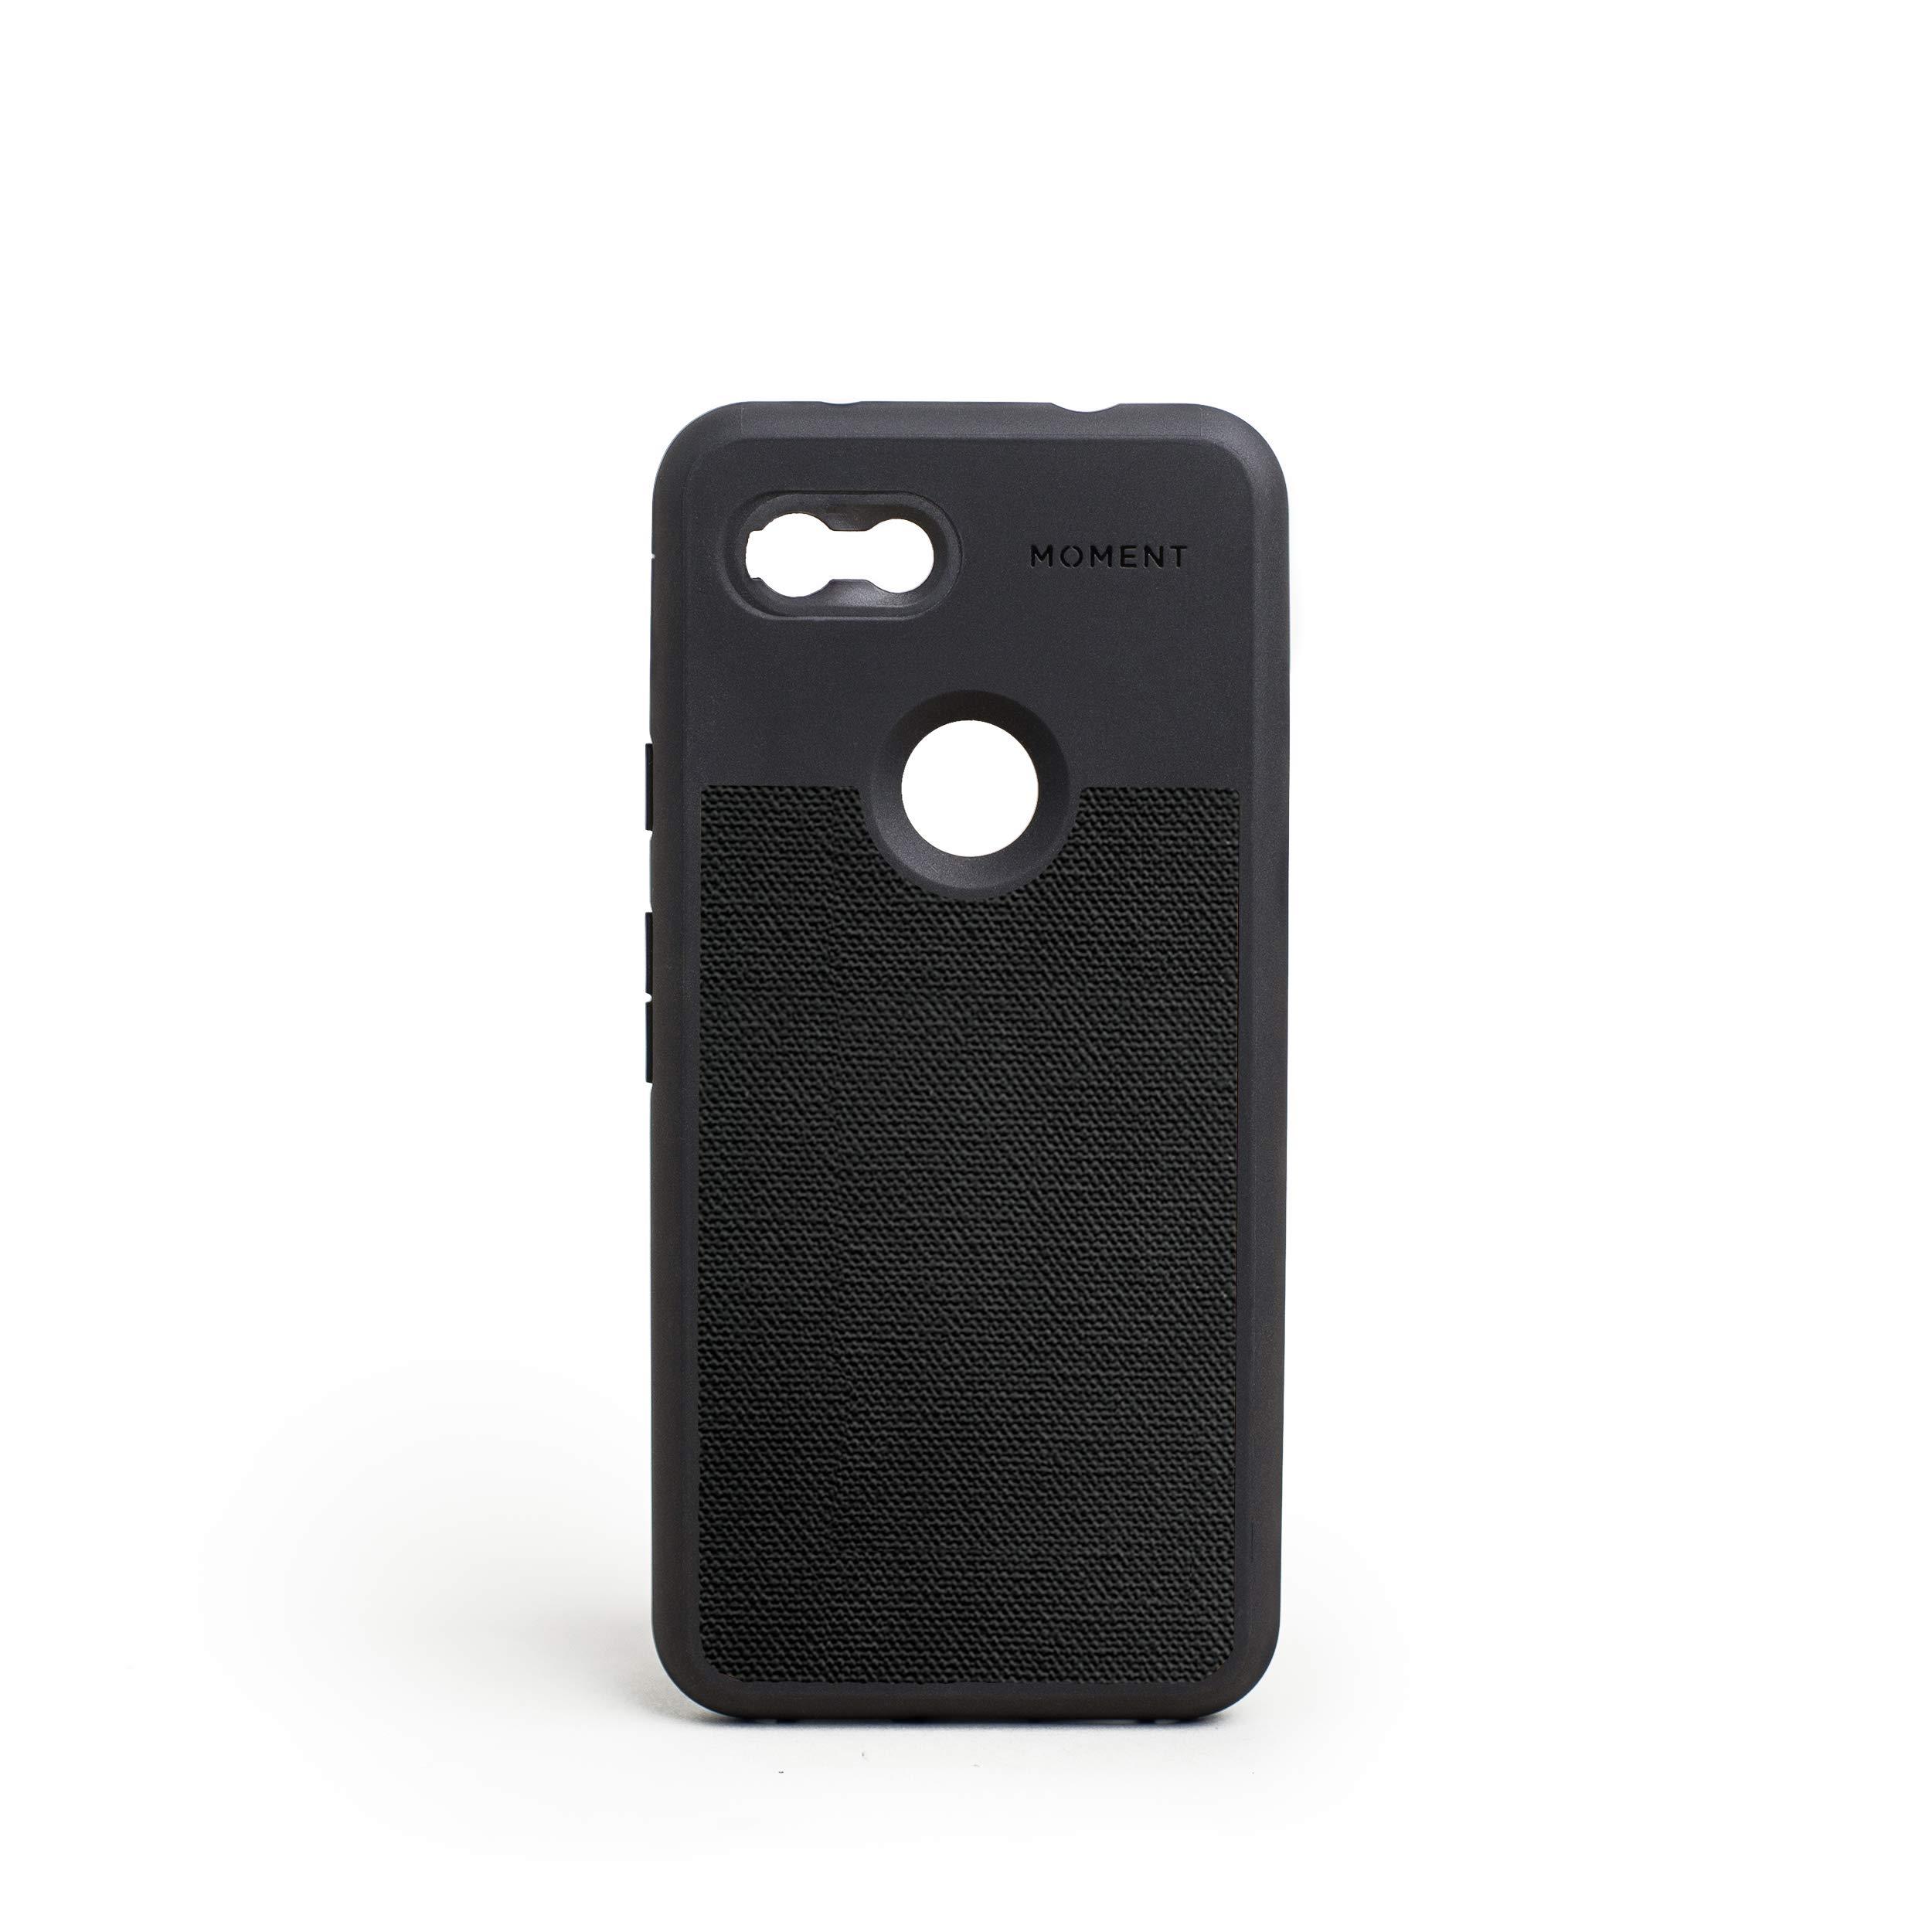 ویکالا · خرید  اصل اورجینال · خرید از آمازون · Pixel 3a Case || Moment Photo Case in Black Canvas - Thin, Protective, Wrist Strap Friendly case for Camera Lovers. wekala · ویکالا